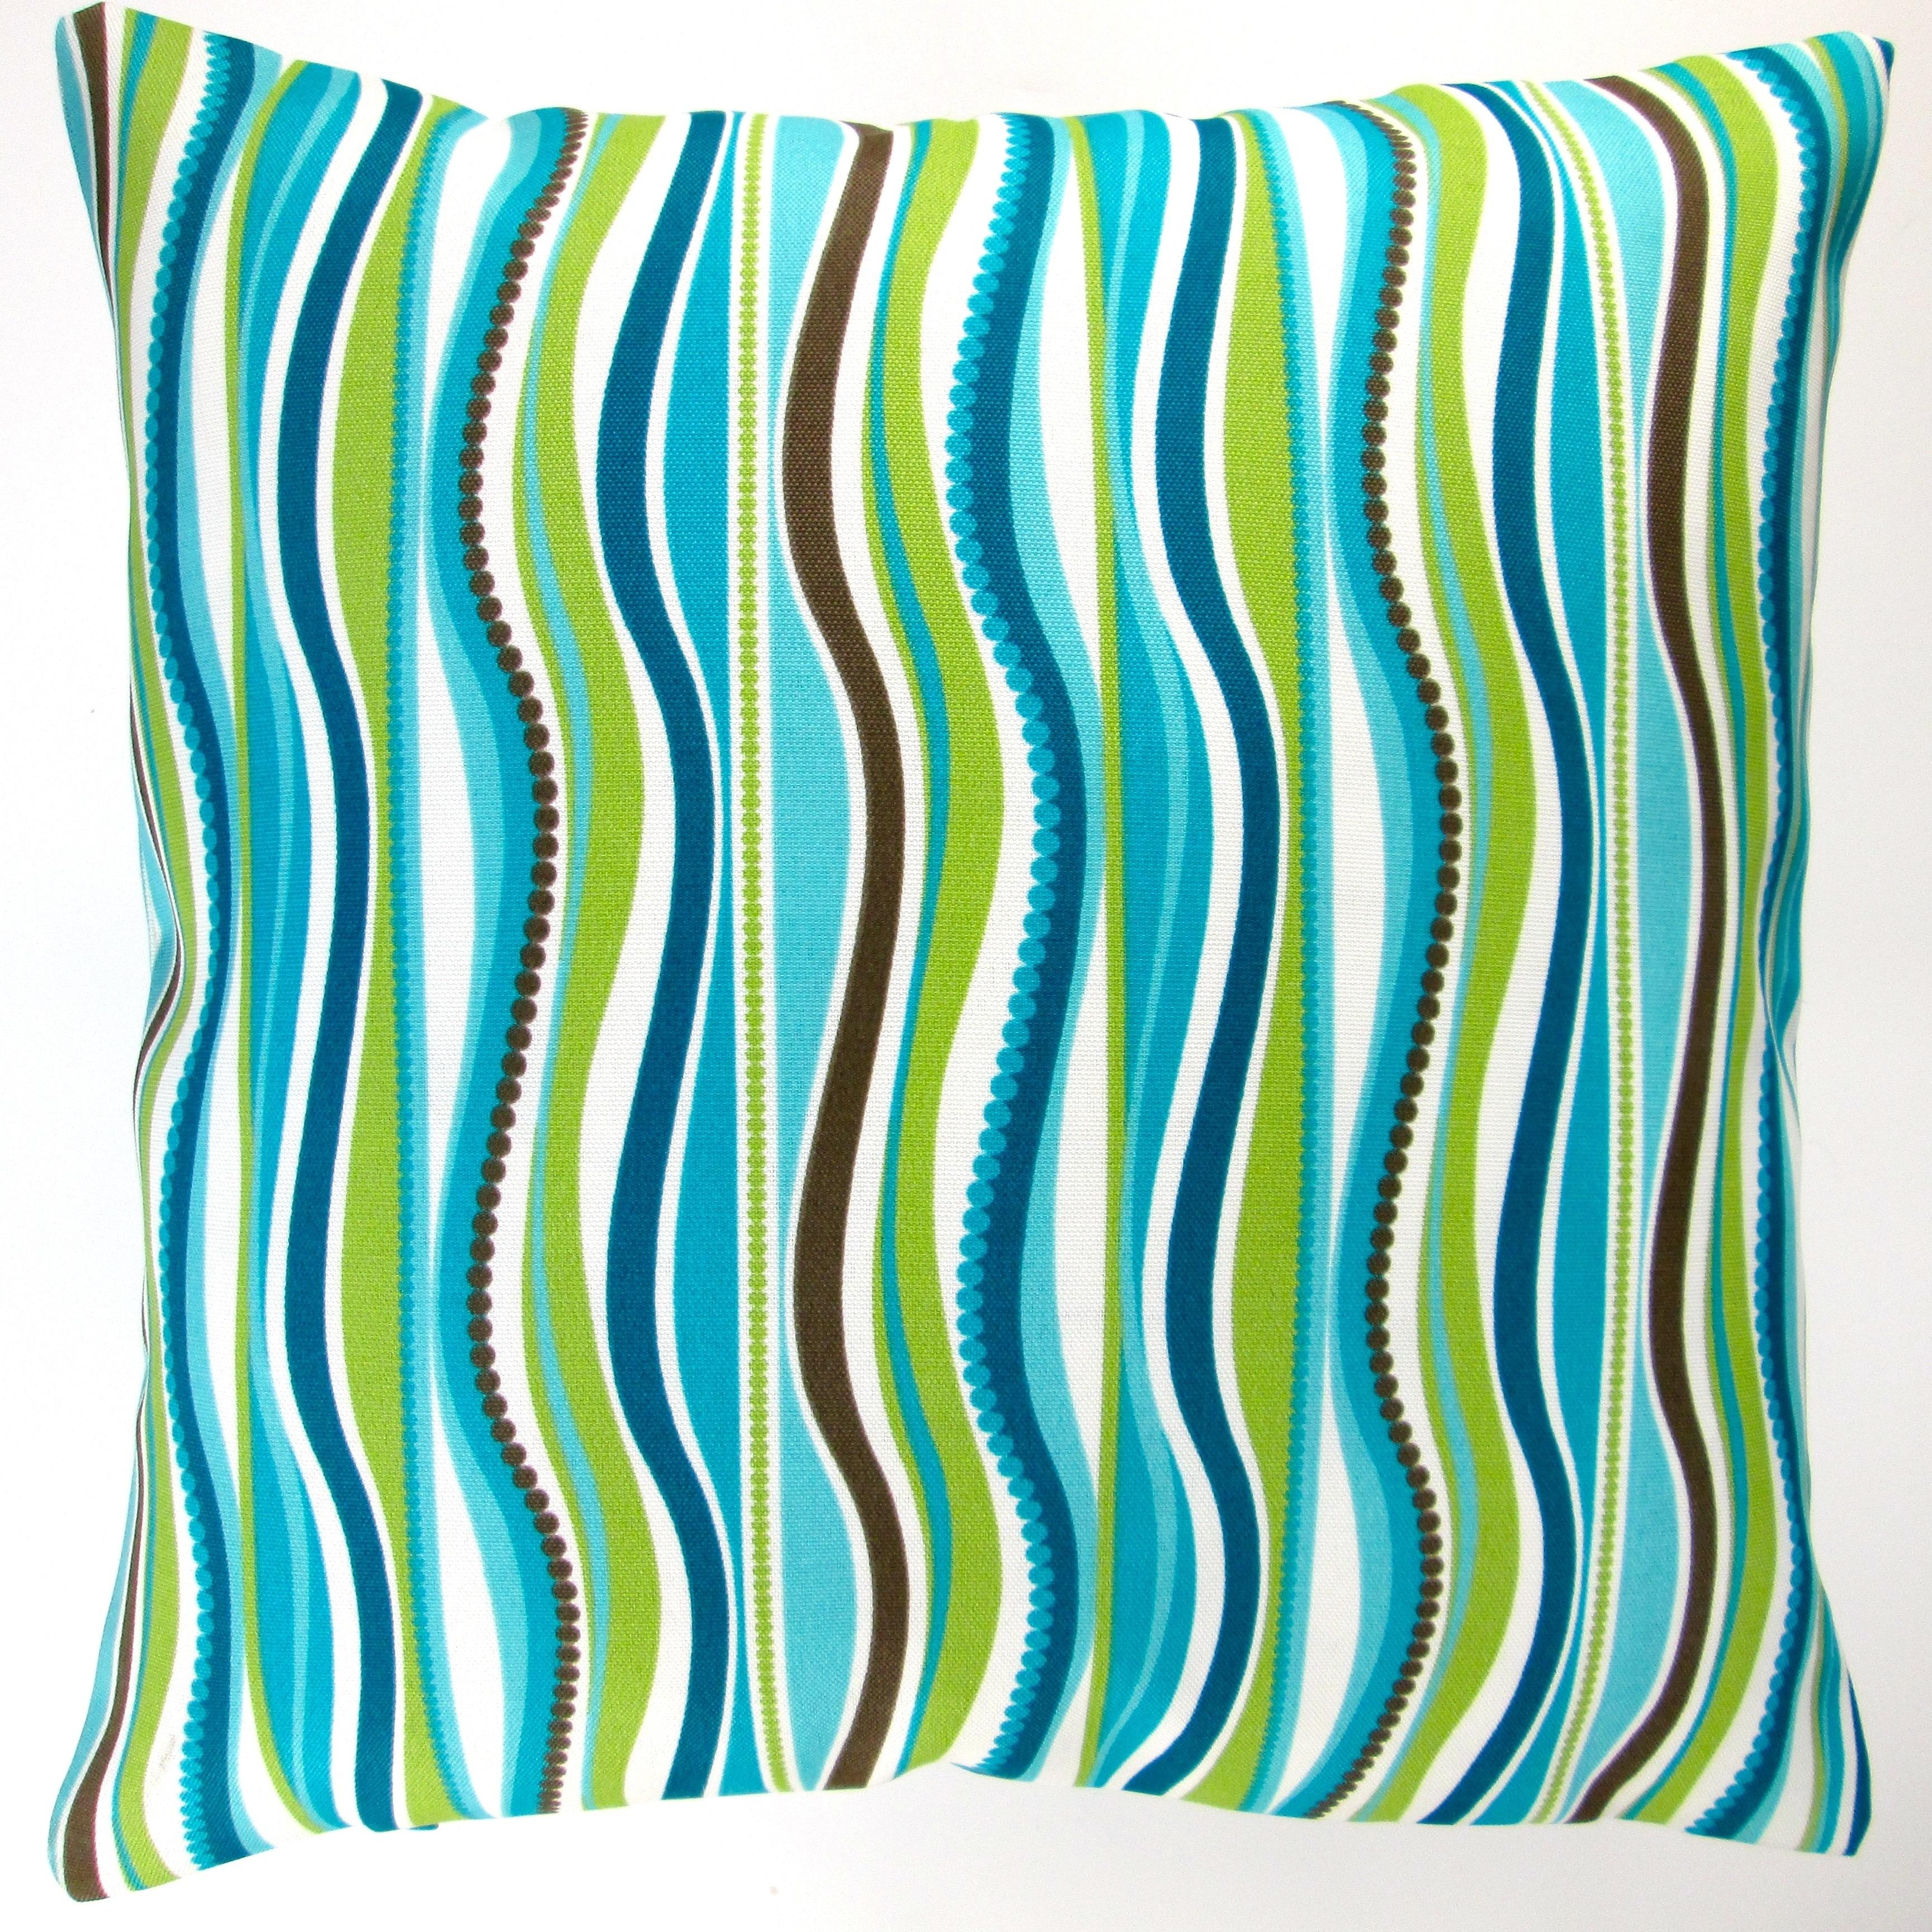 Shop Artisan Pillows Indoor  Outdoor 18-inch Blue Green Stripe Modern  Caribbean Coastal Beach House Throw Pillow Cover (Set of 2) - On Sale -  Free Shipping ... fd2f17e5af0a